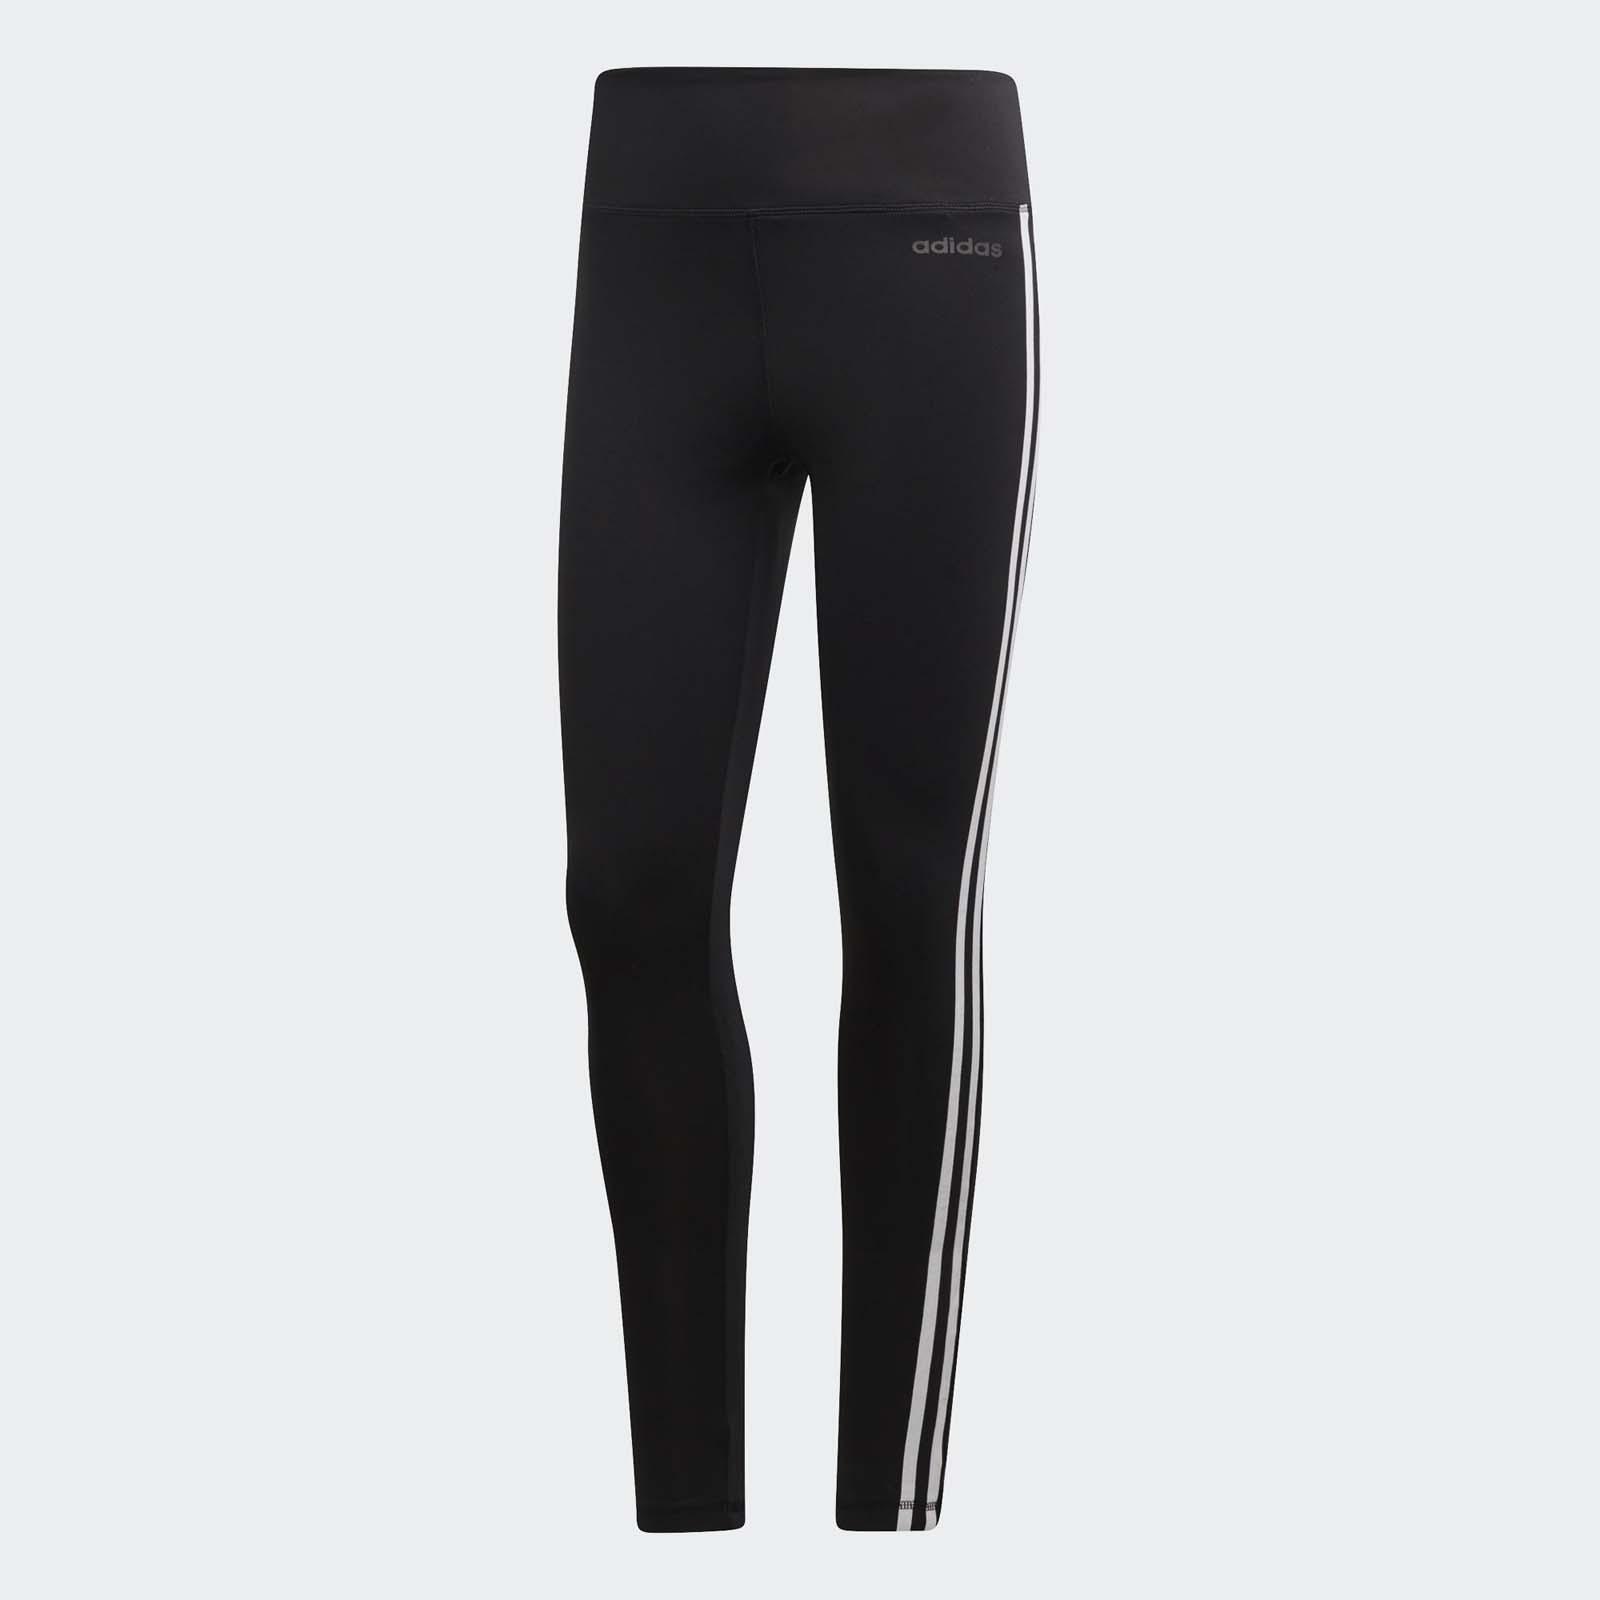 adidas 緊身褲 3-Stripes High Rise Tights 黑 白 三條線 女款【ACS】 DU2040